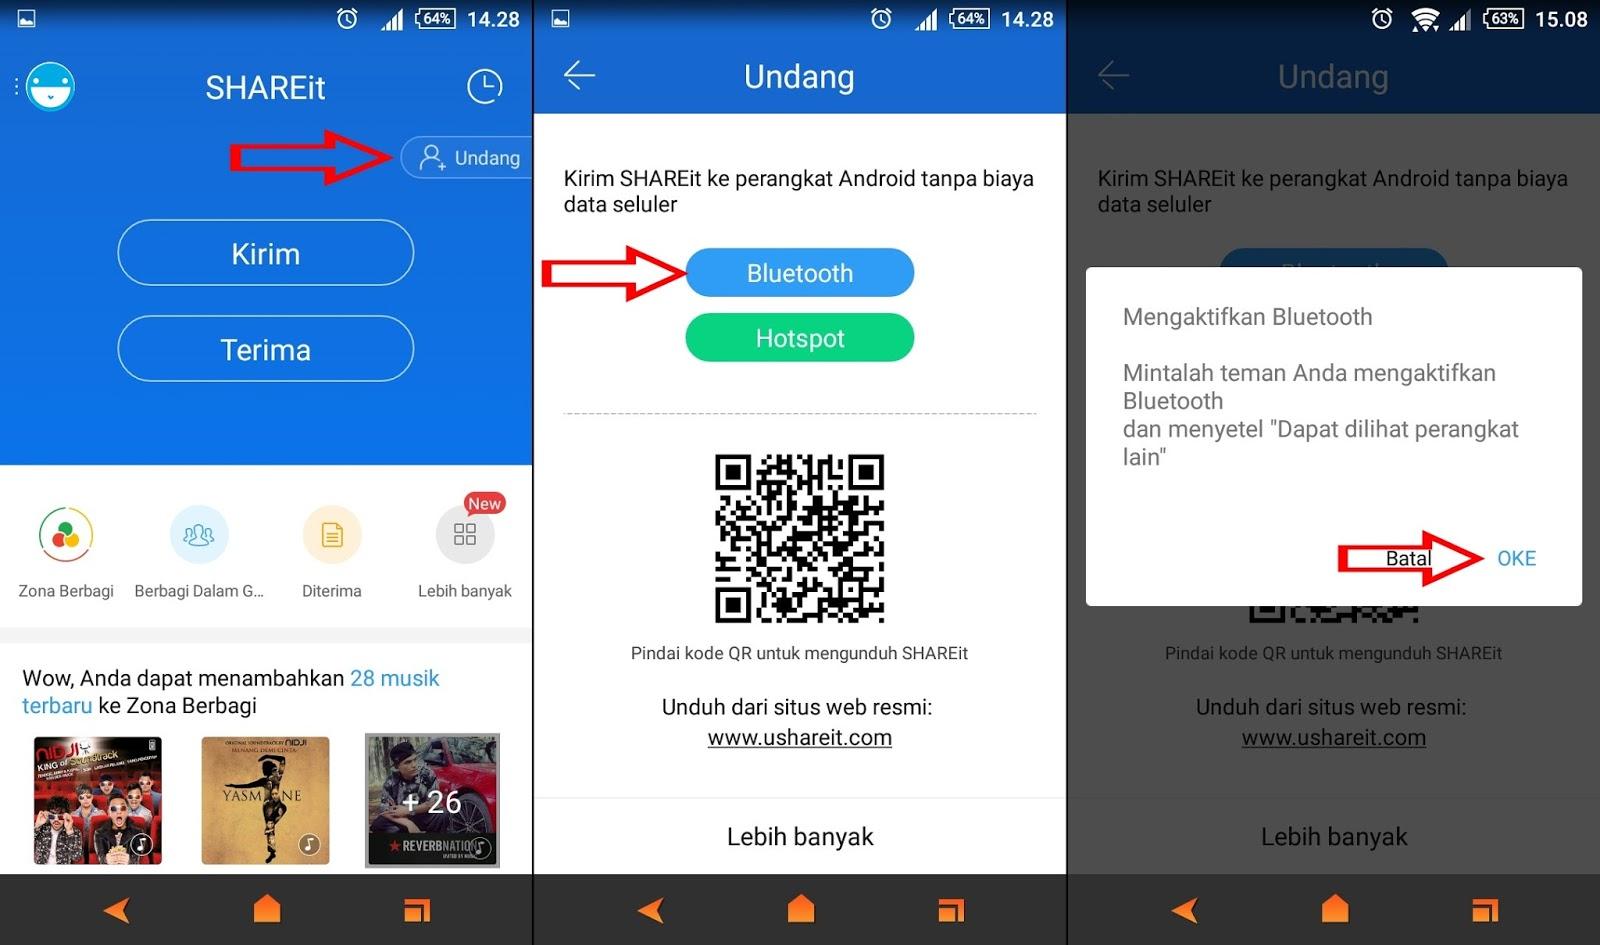 Cara Berbagi Aplikasi Shareit Melalui Bluetooth Menit Info